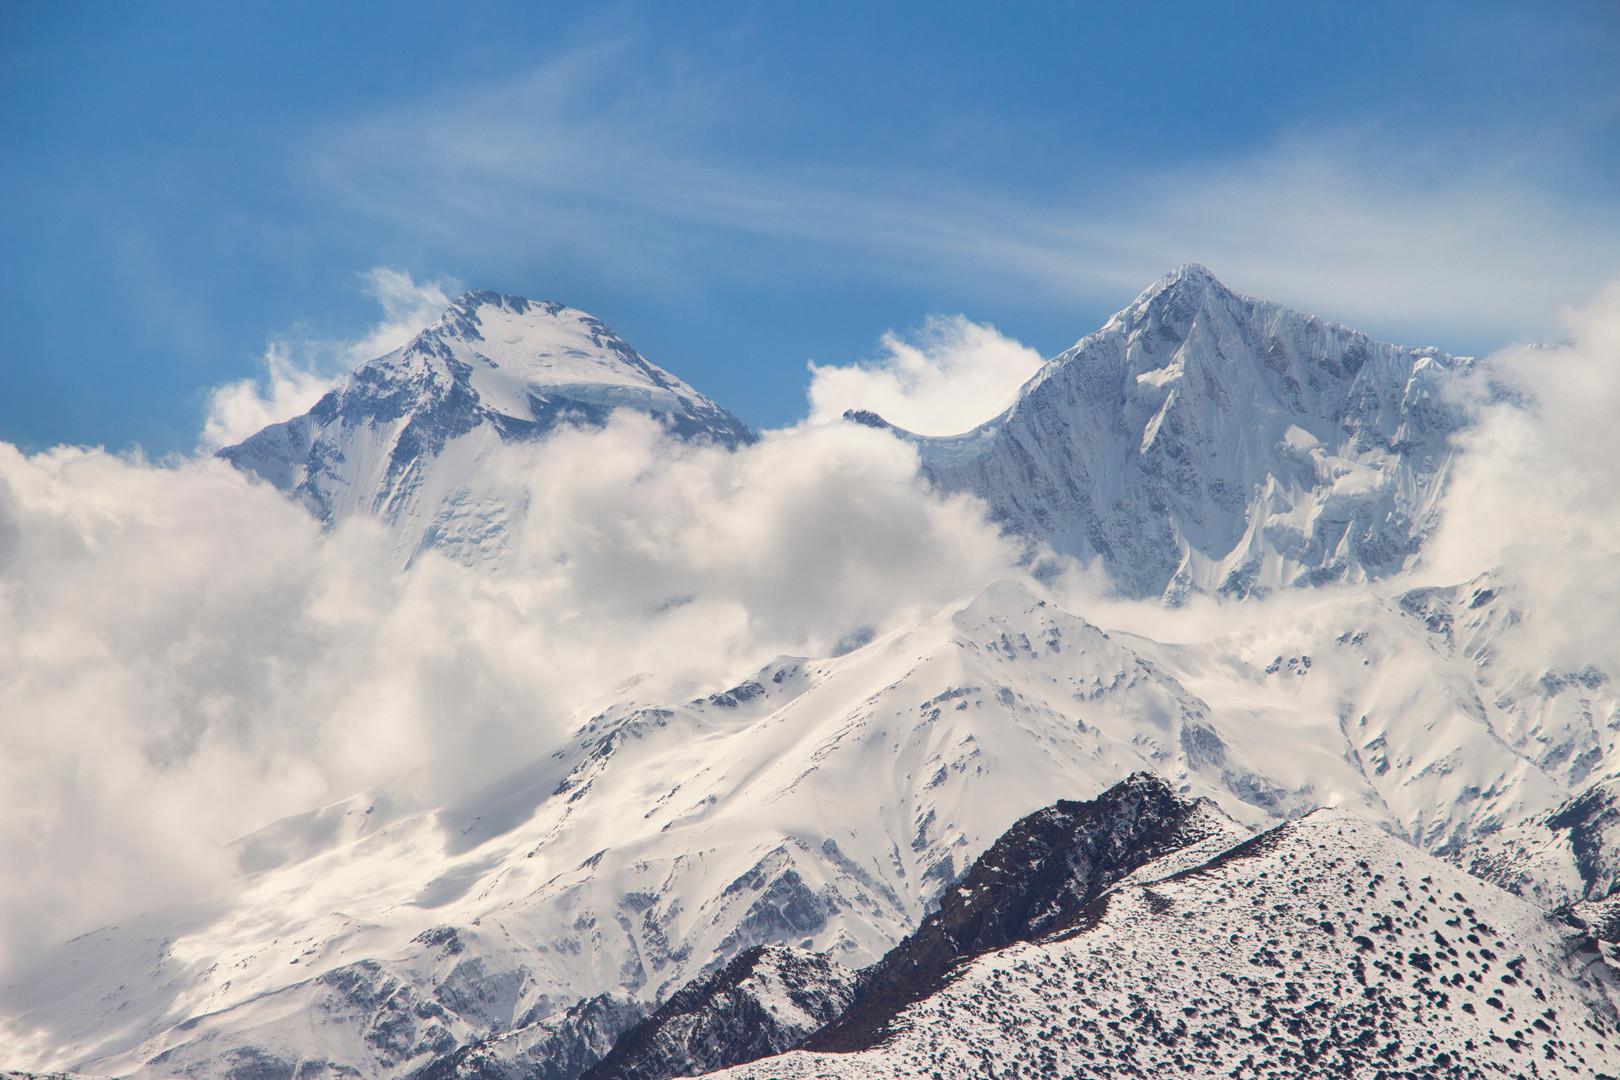 Dhaulagiri and Tukuche peak